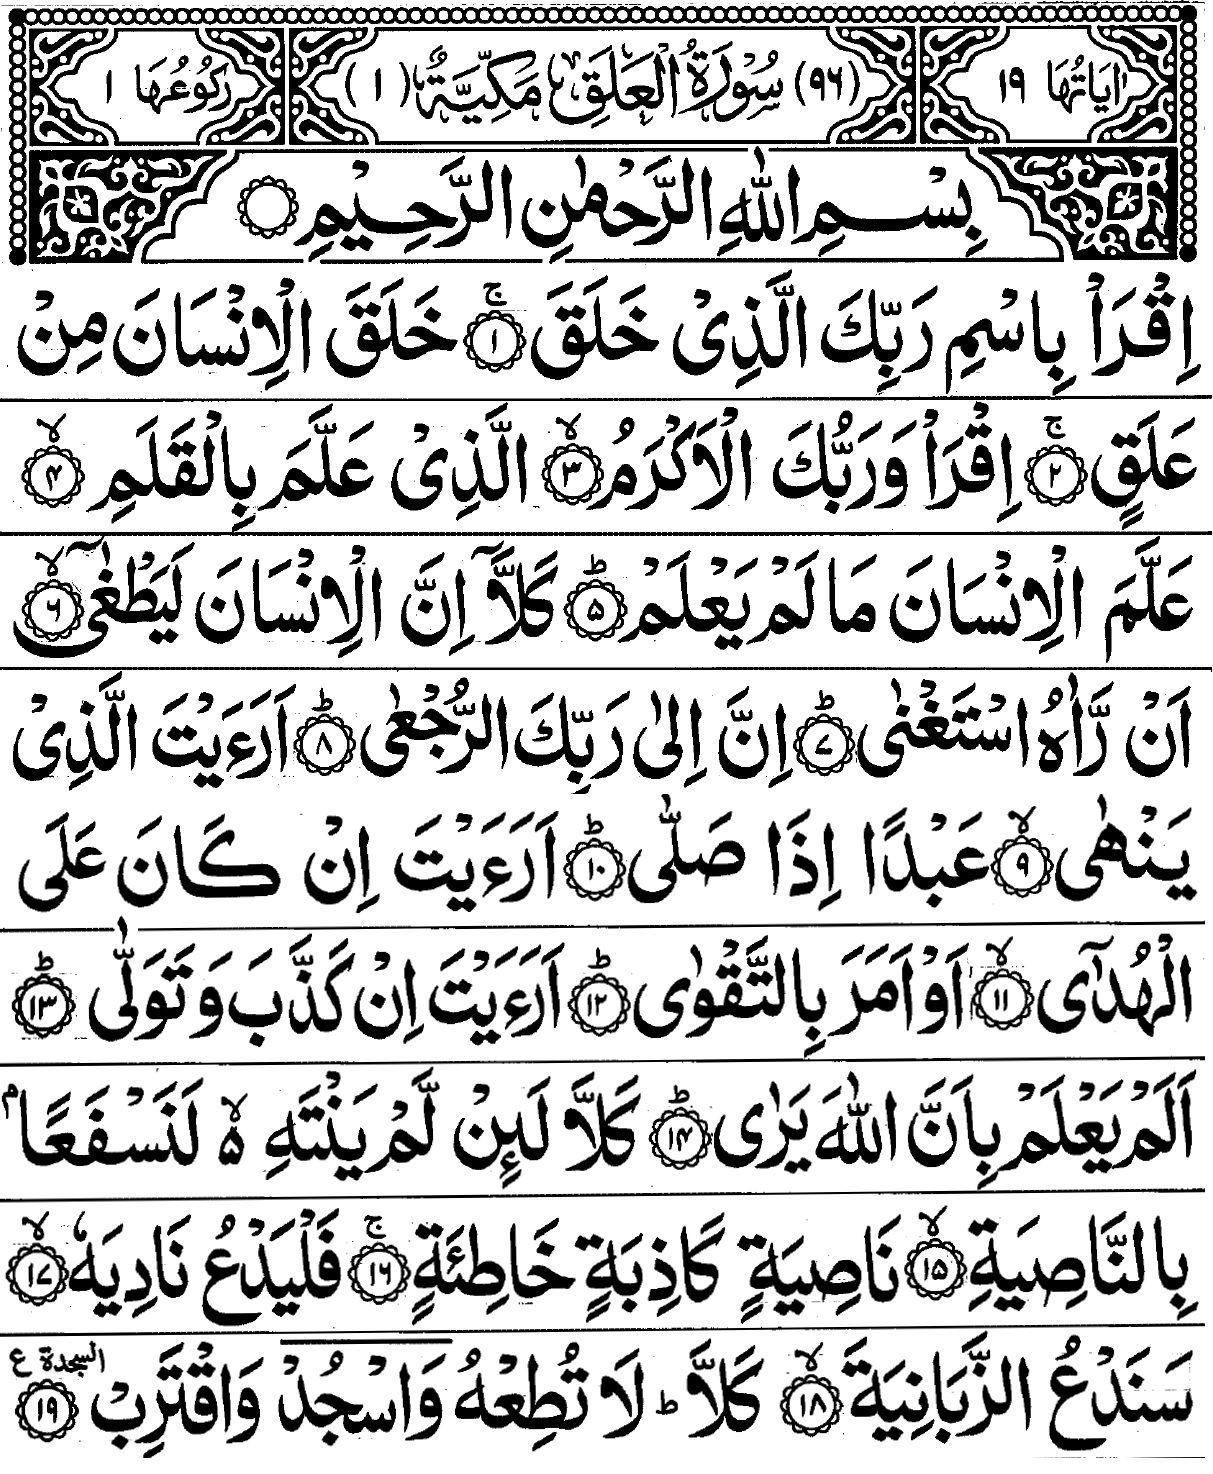 Surah Al Alaq : surah, Islam, Ultimate, Peace